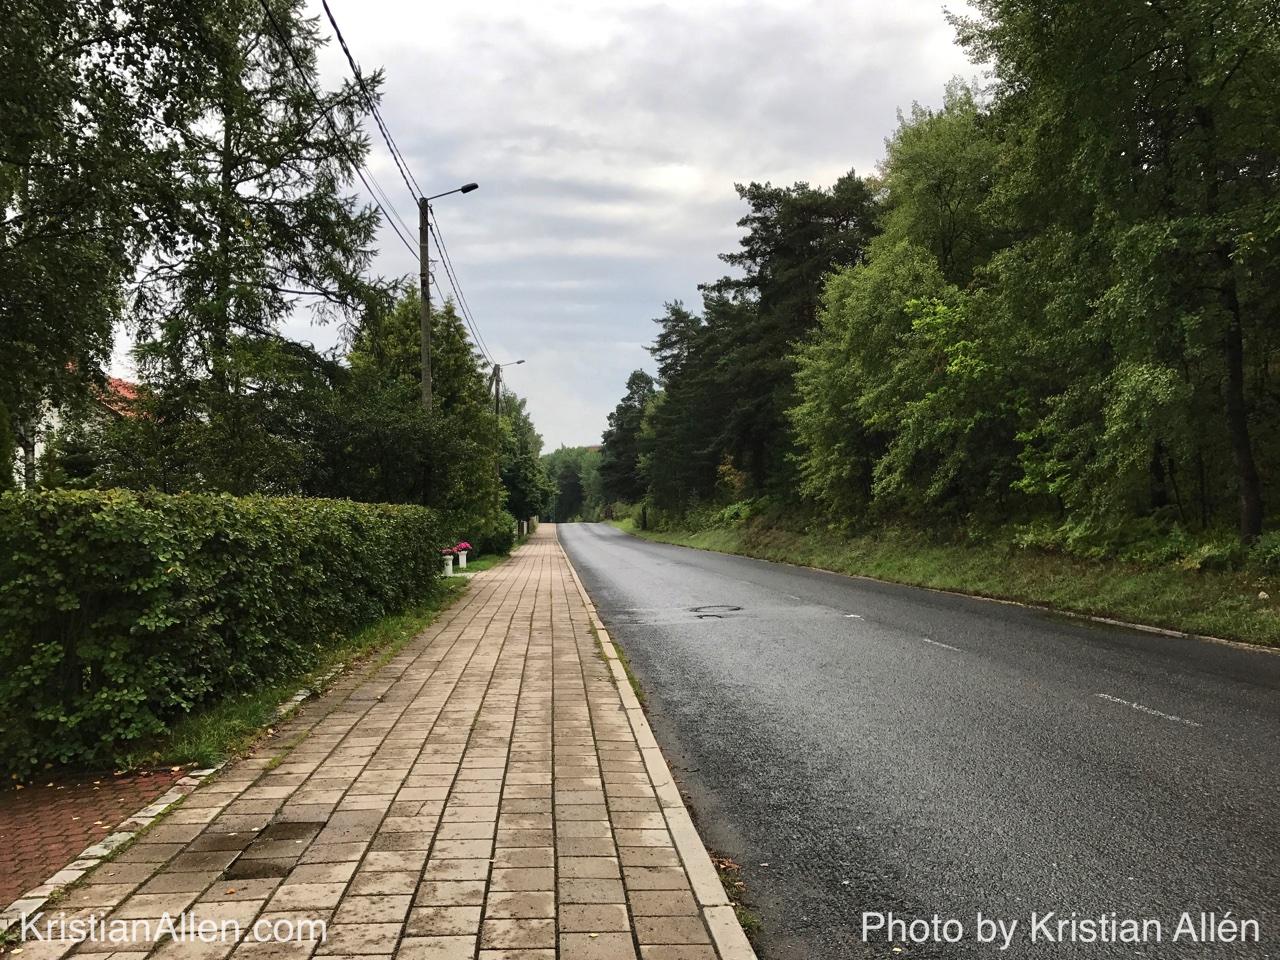 31.8.2017 11.06 km Run